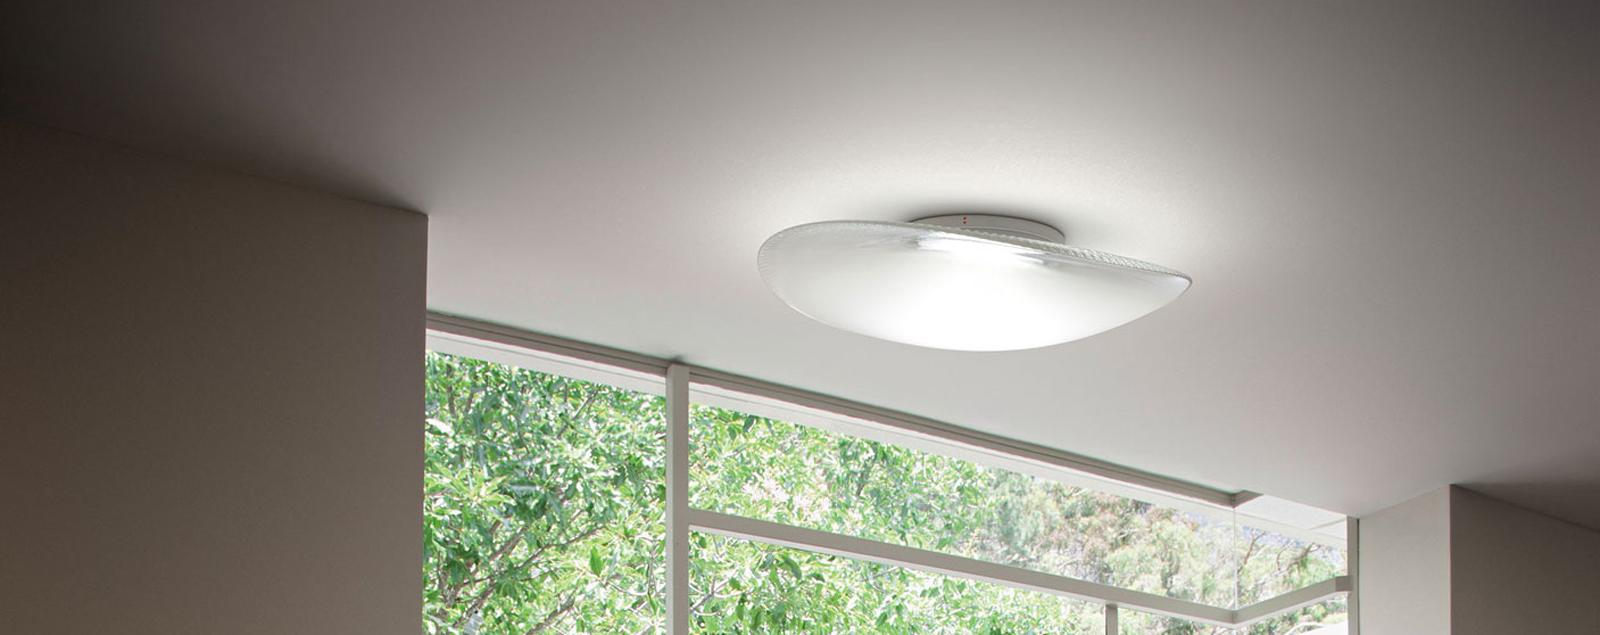 F35 Loop wall and ceiling lamp - Fabbian Illuminazione